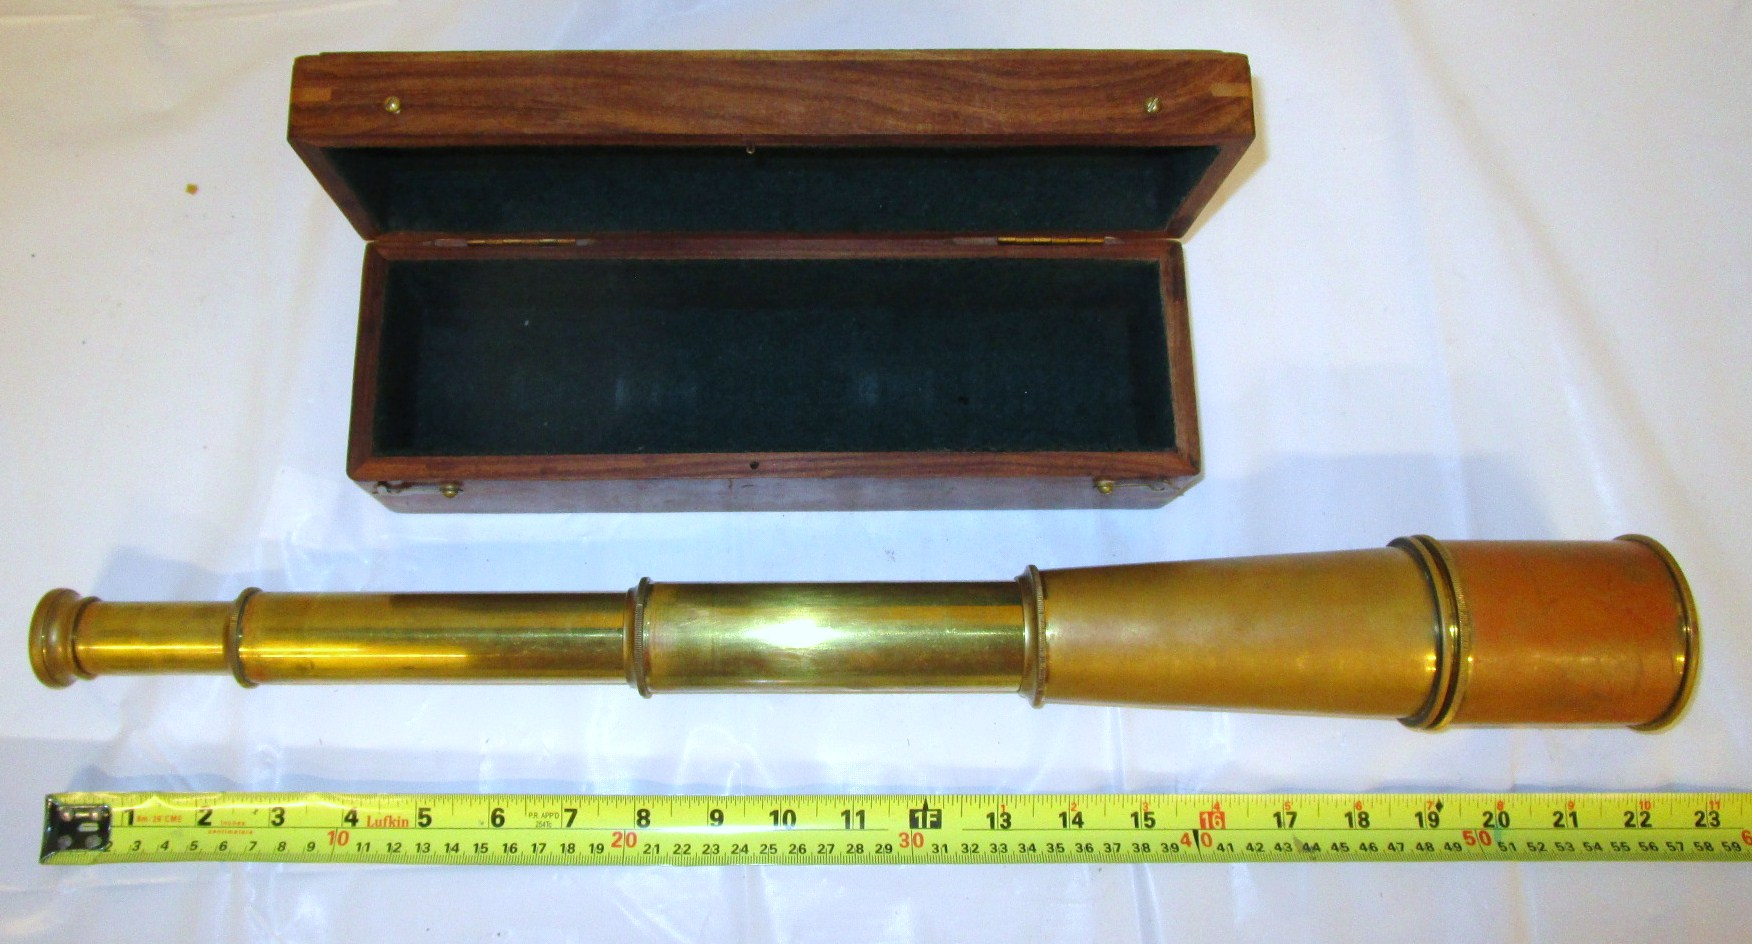 Brass telescope - extendable